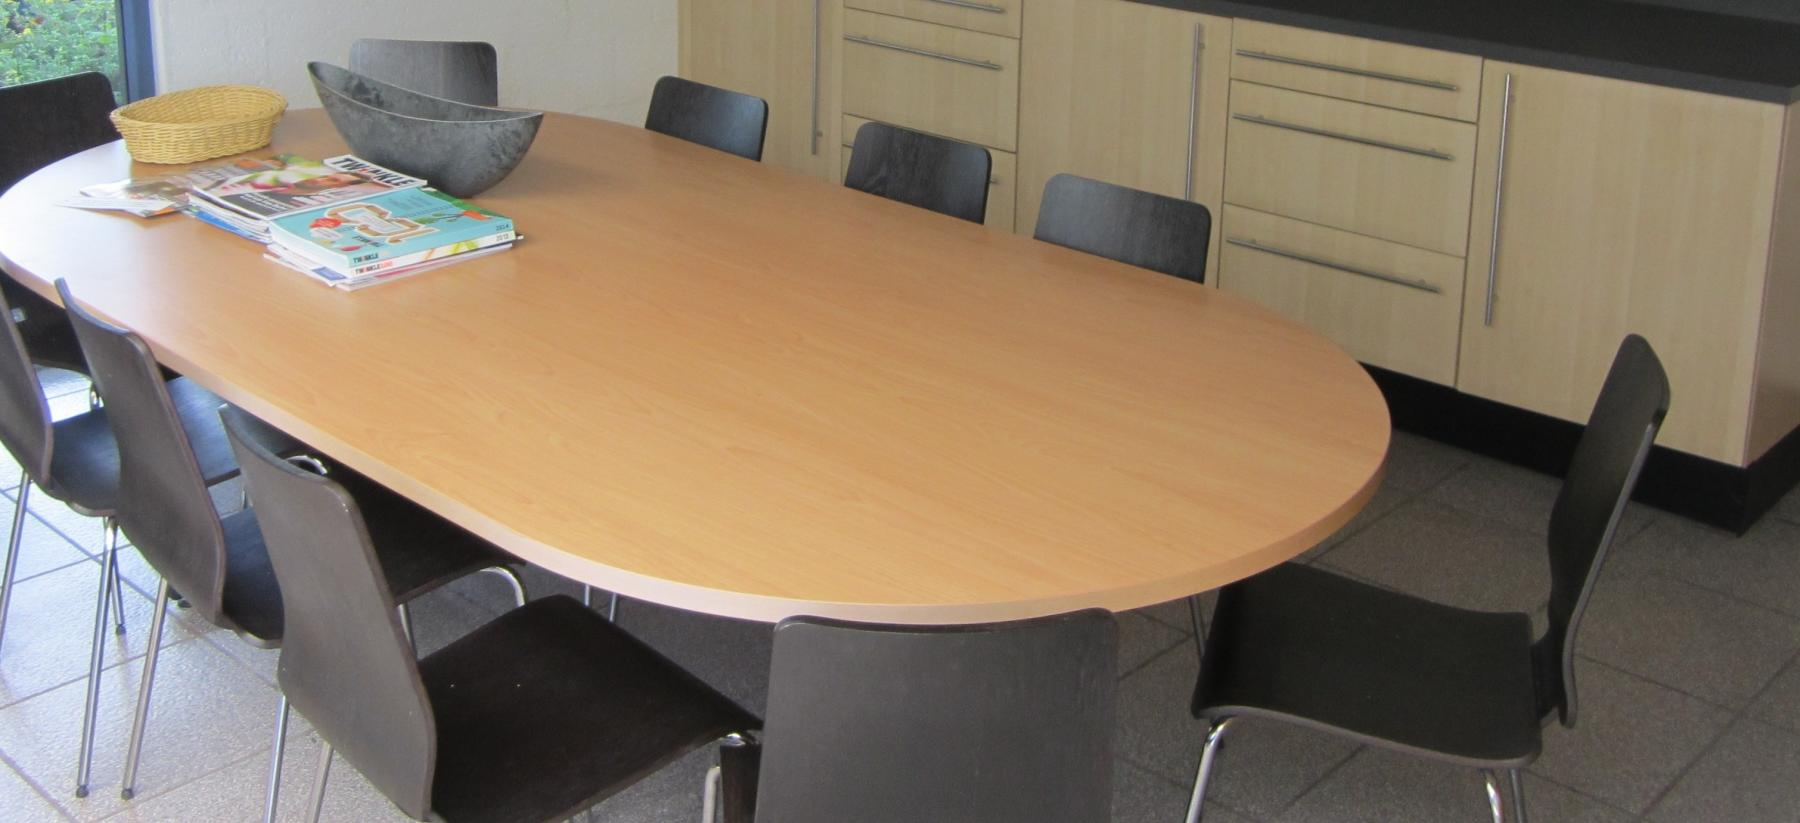 vergaderruimte cuijk kantoorpand tafel stoelen pantry